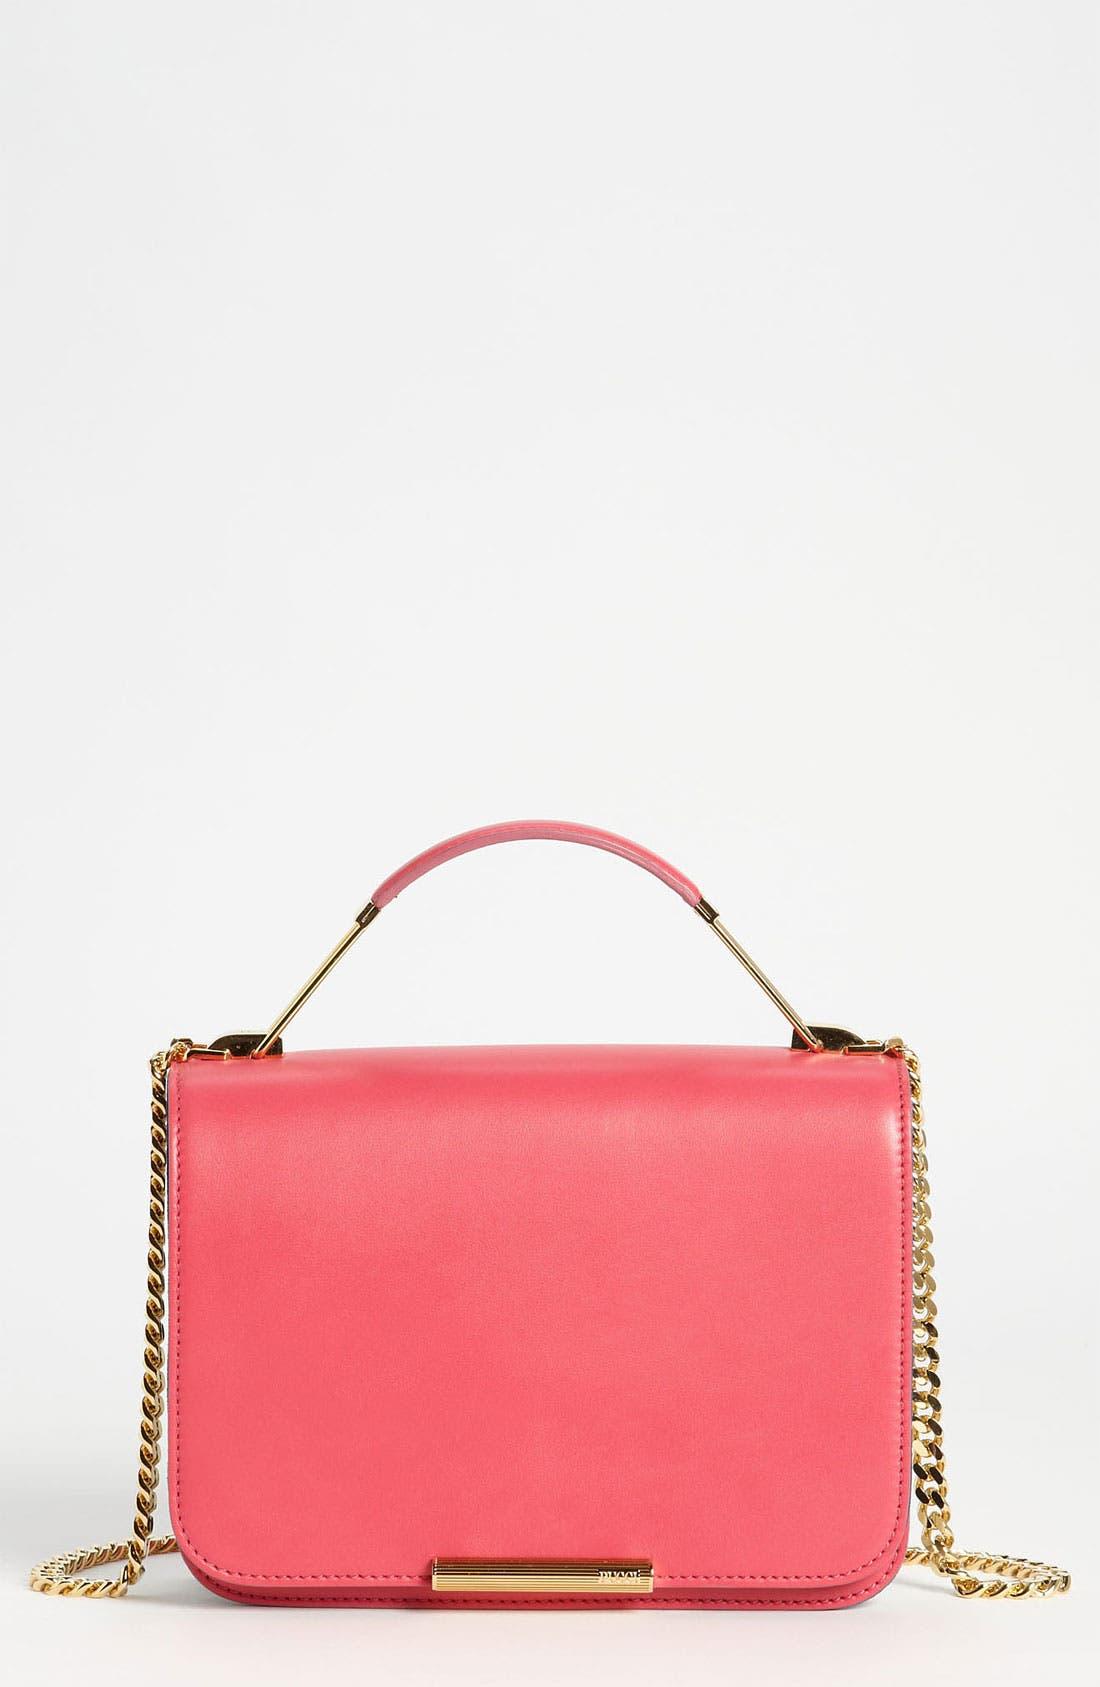 Alternate Image 1 Selected - Emilio Pucci Partitioned Leather Shoulder Bag